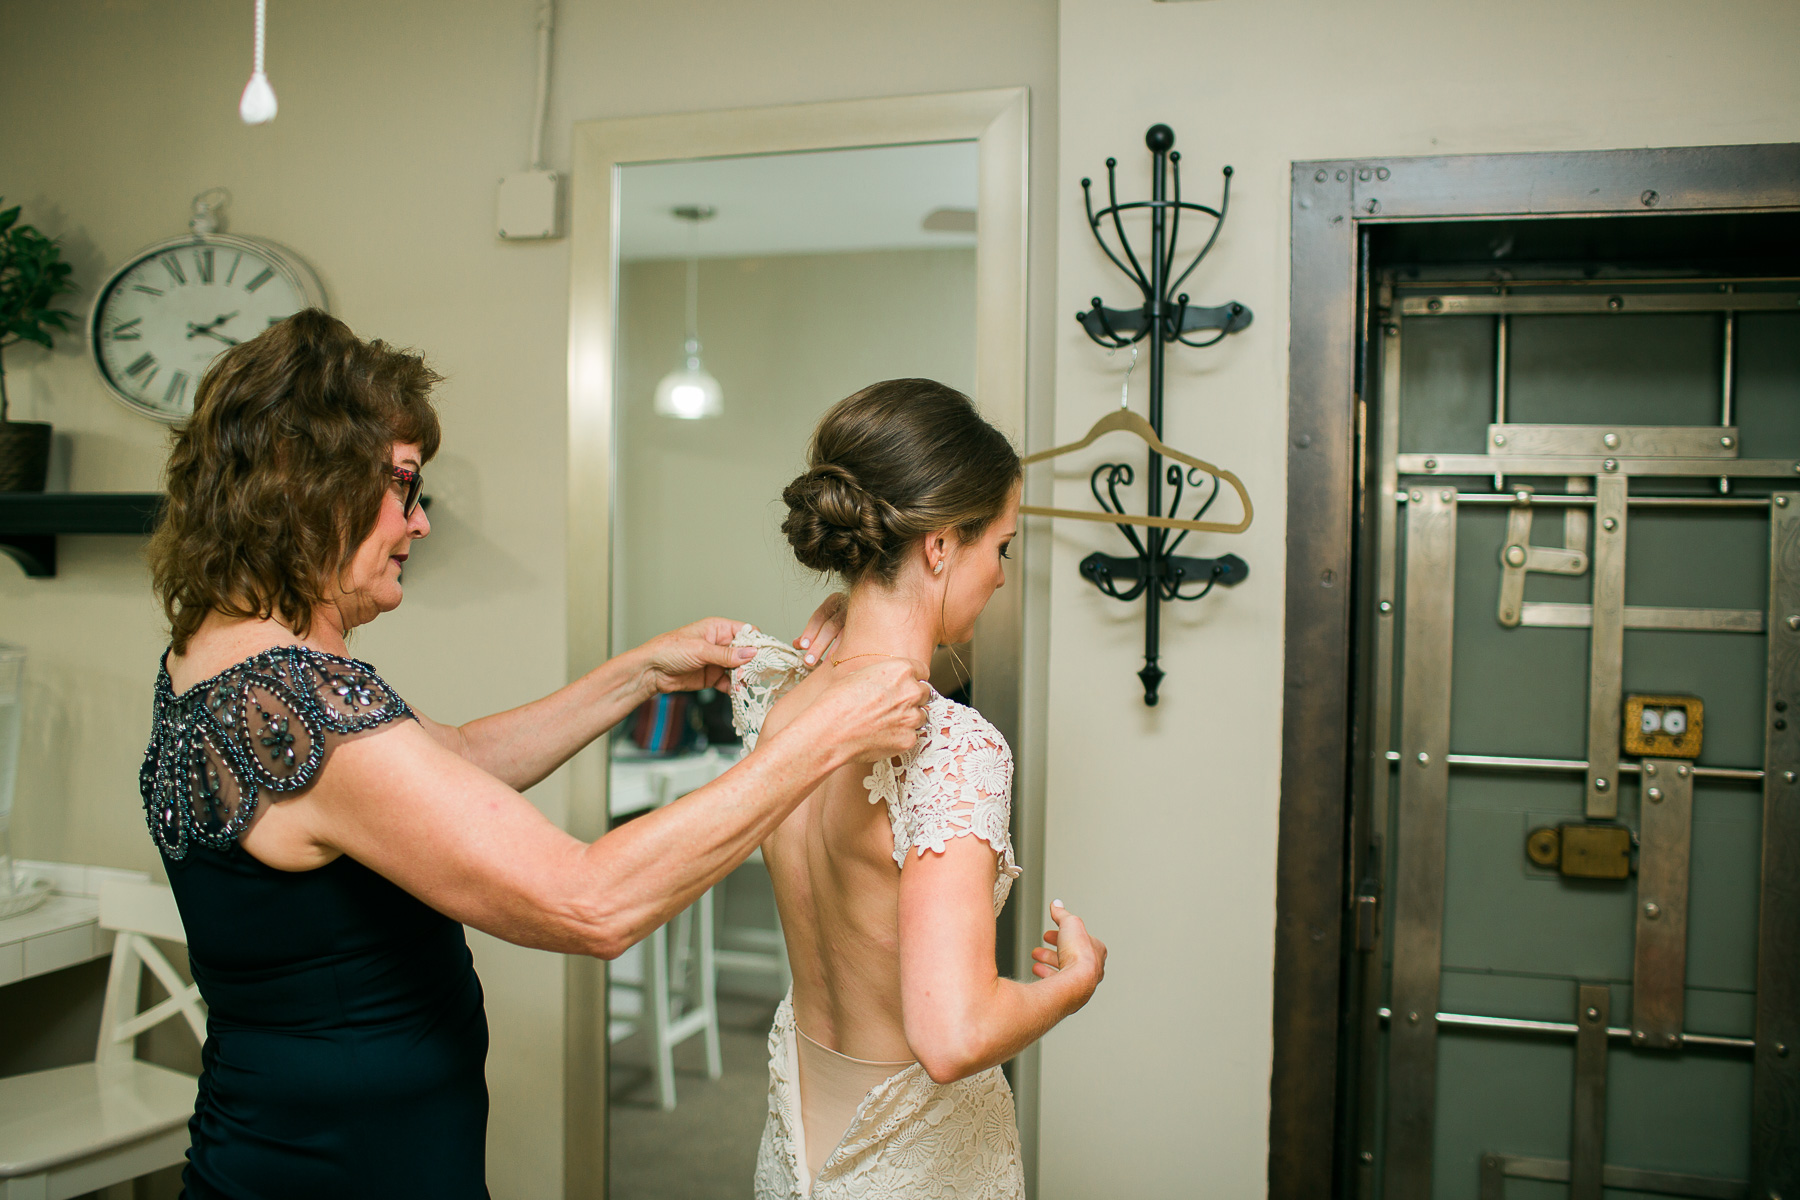 Mom pinning bride's dress